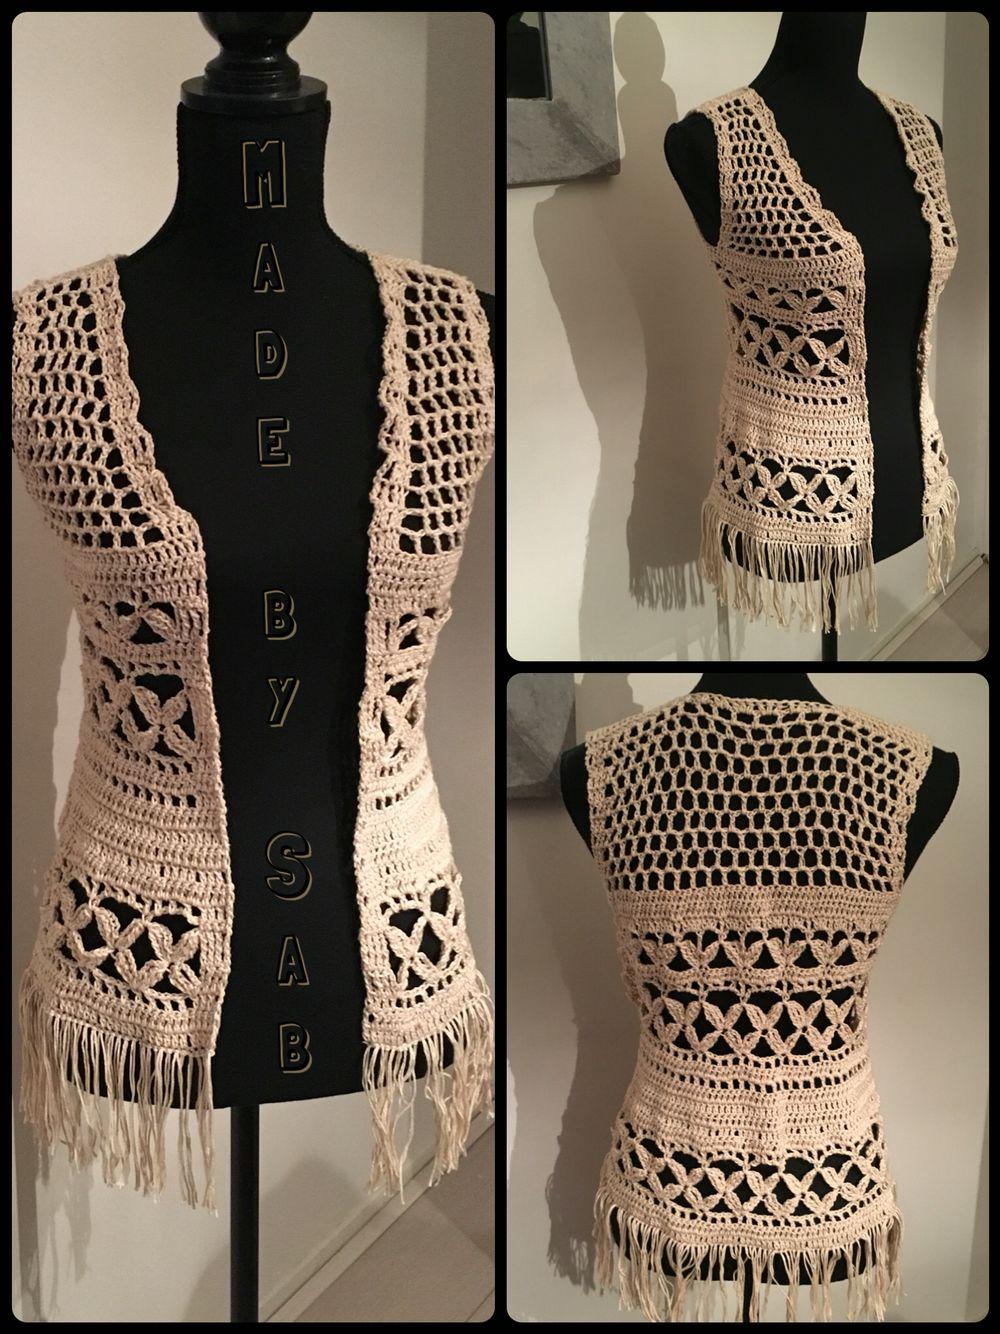 Boho Vestje Zomer Zandkleurig Gehaakt Naar Patroon Van Trippy Hippy Crochet Afghan Pattern Kingdom Garnstudio